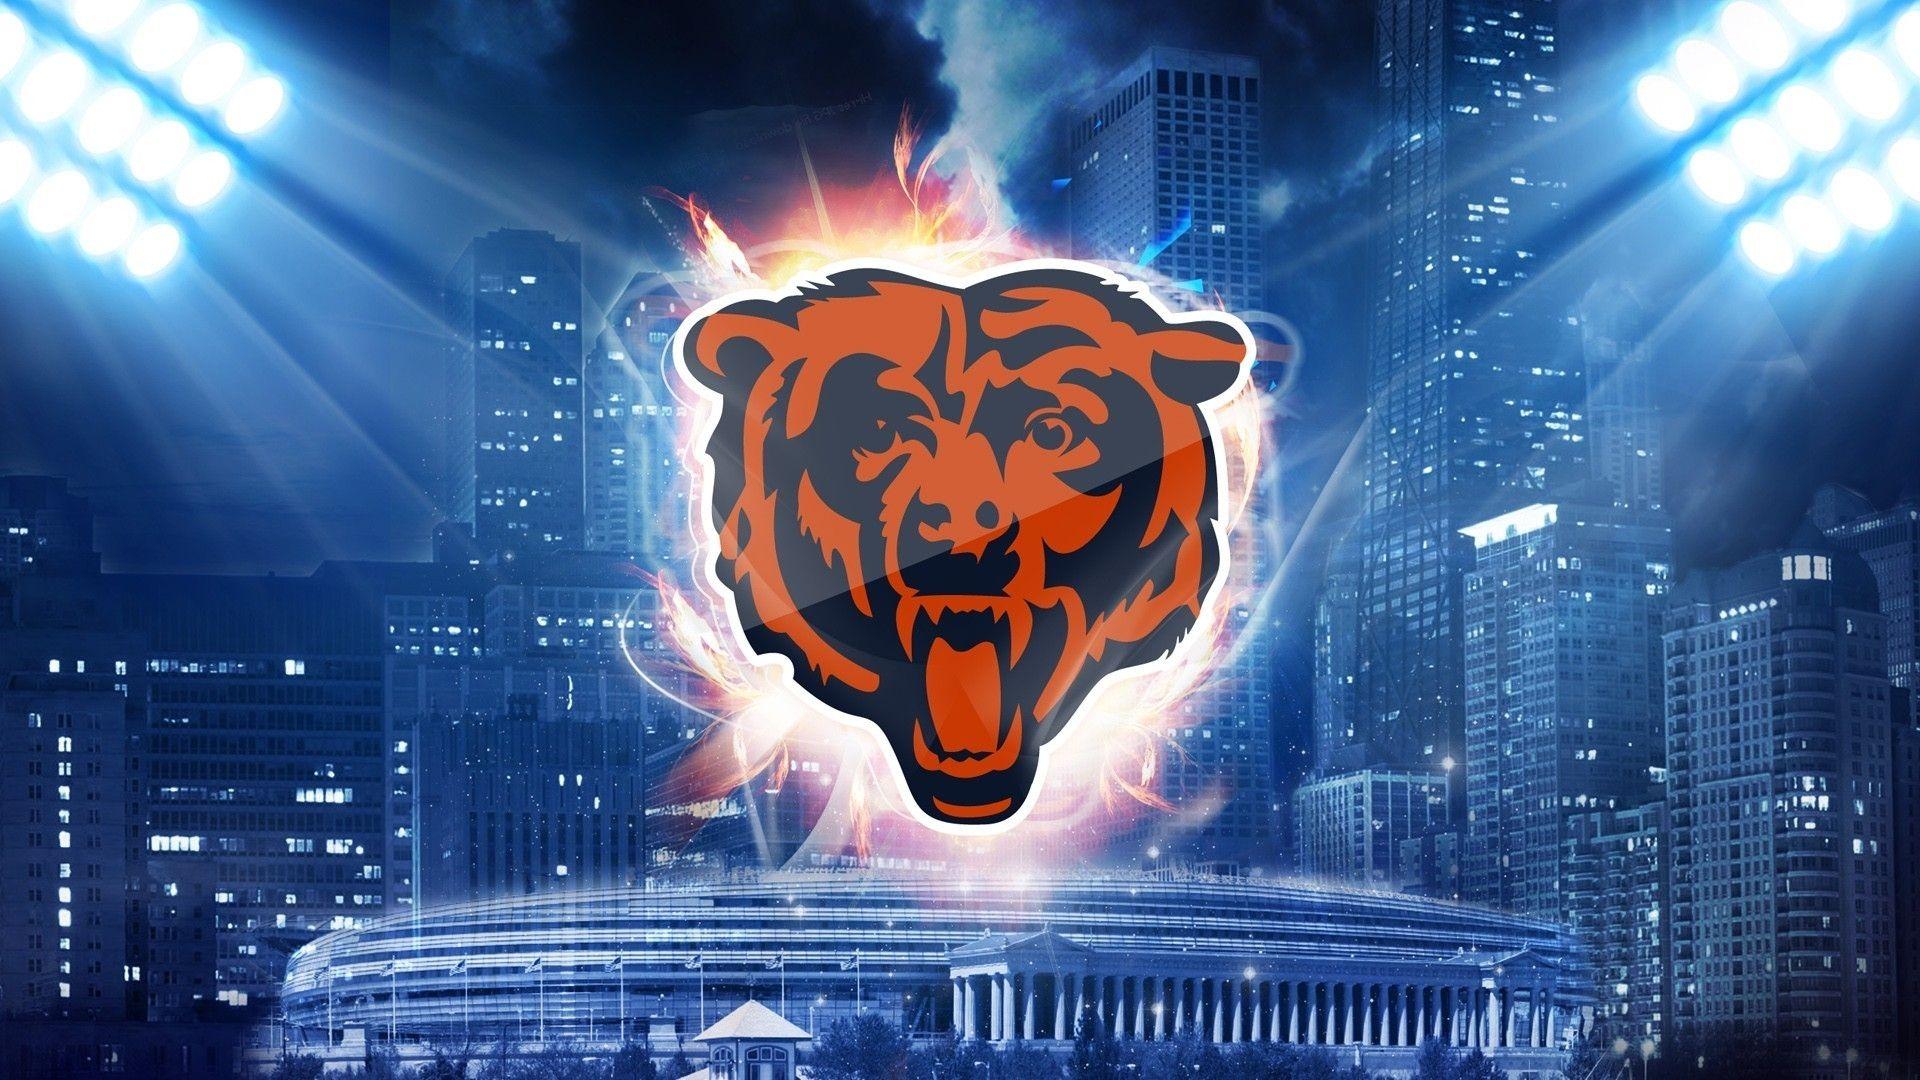 10 Most Popular Chicago Bears Hd Wallpaper Full Hd 1080p For Pc Desktop 2019 Chicago Bears Wallpaper Chicago Bears Logo Bear Wallpaper